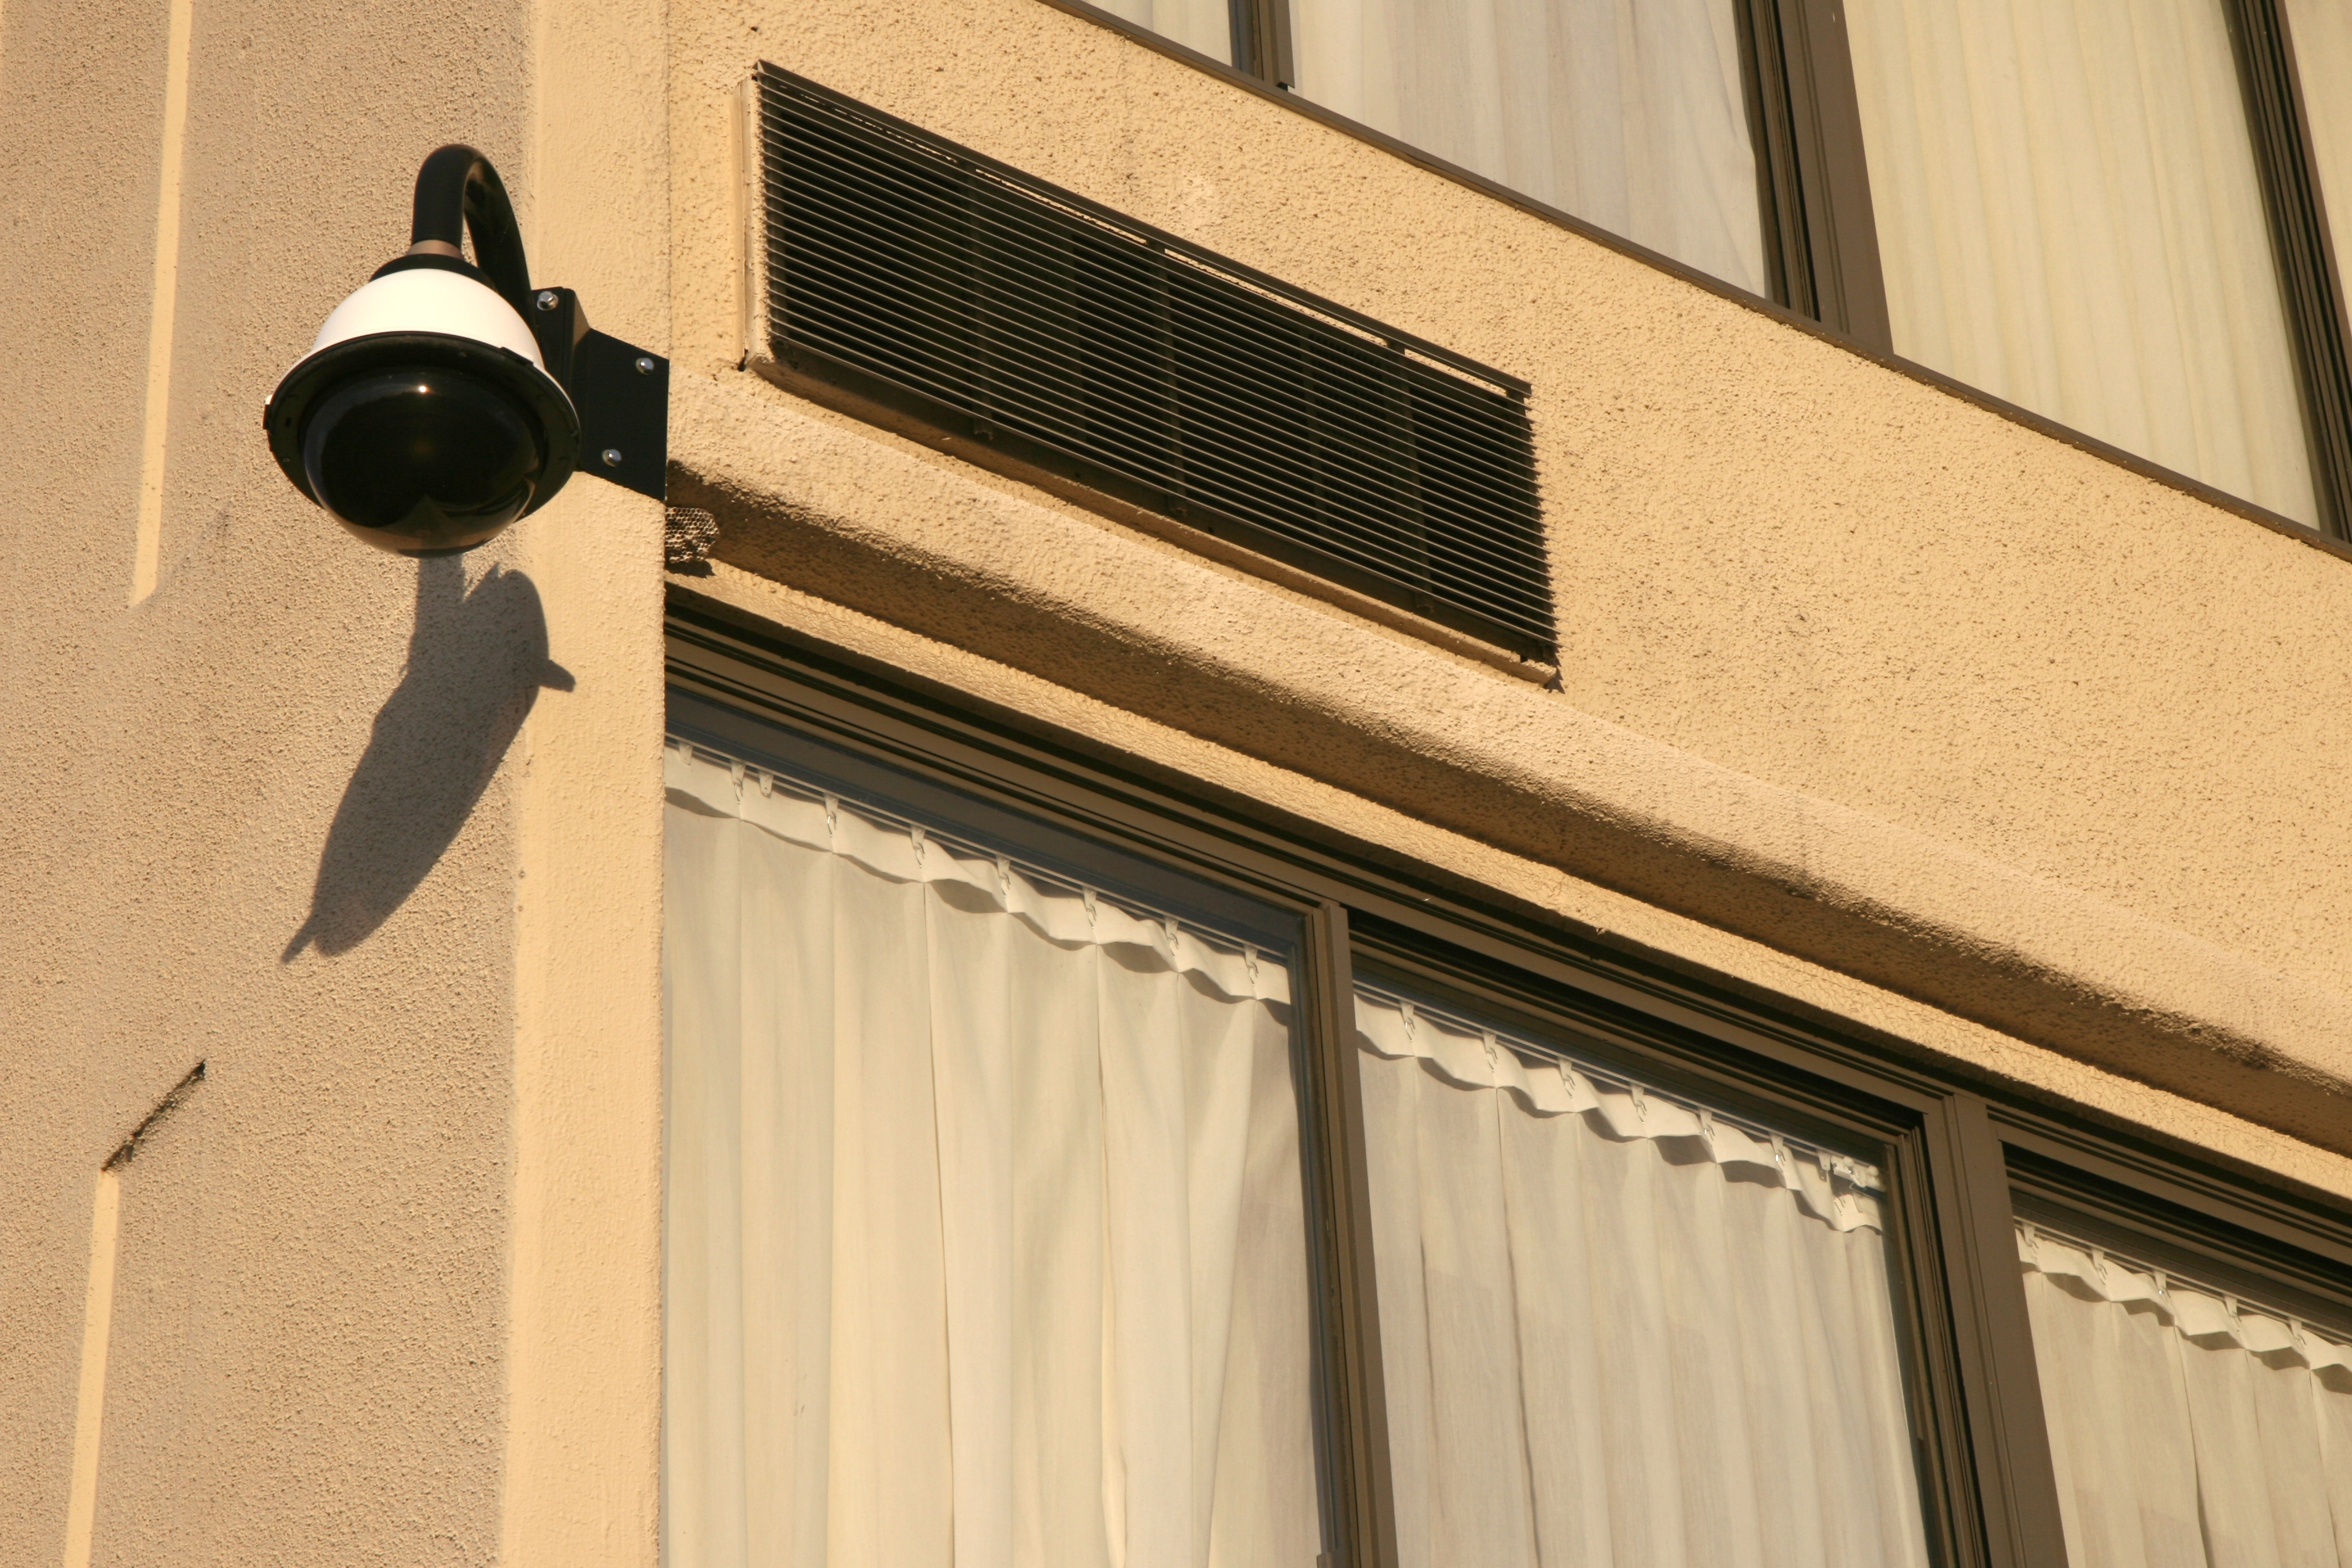 Security Cameras as a Factor of Disturbance